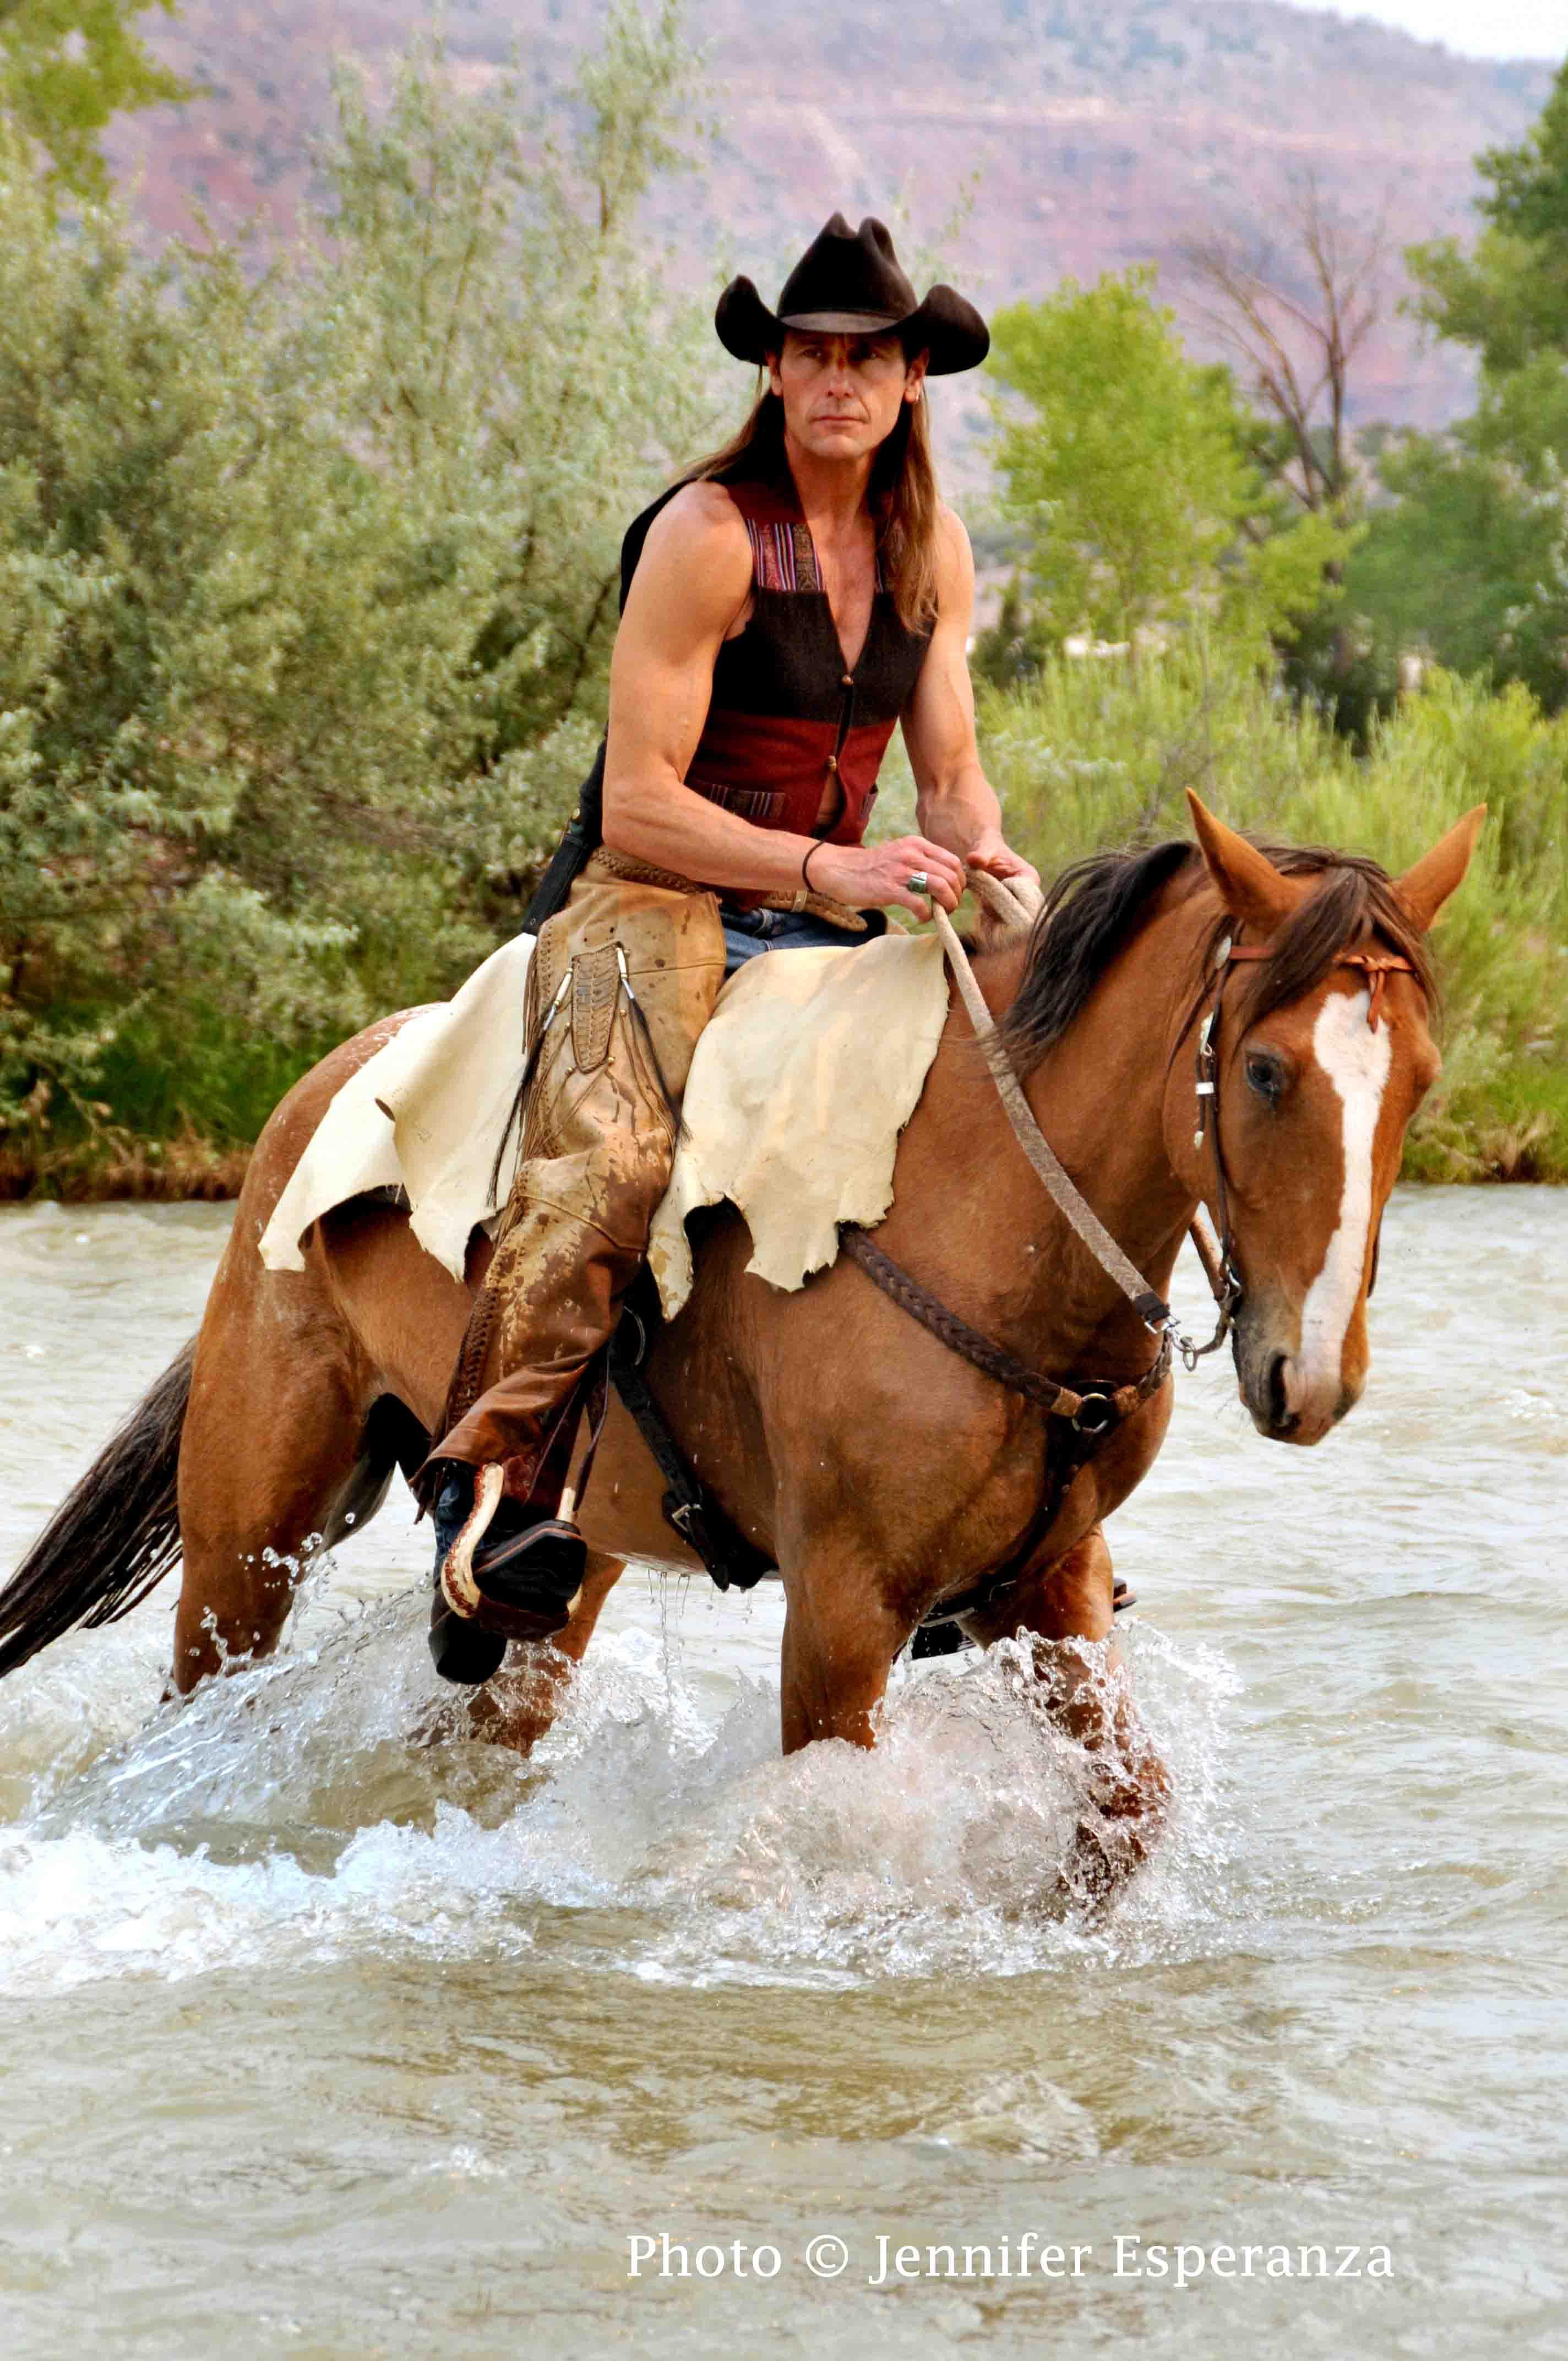 James Anaquad Kleinert in Wild Horses and Renegades, courtesy Jennifer Esperanza